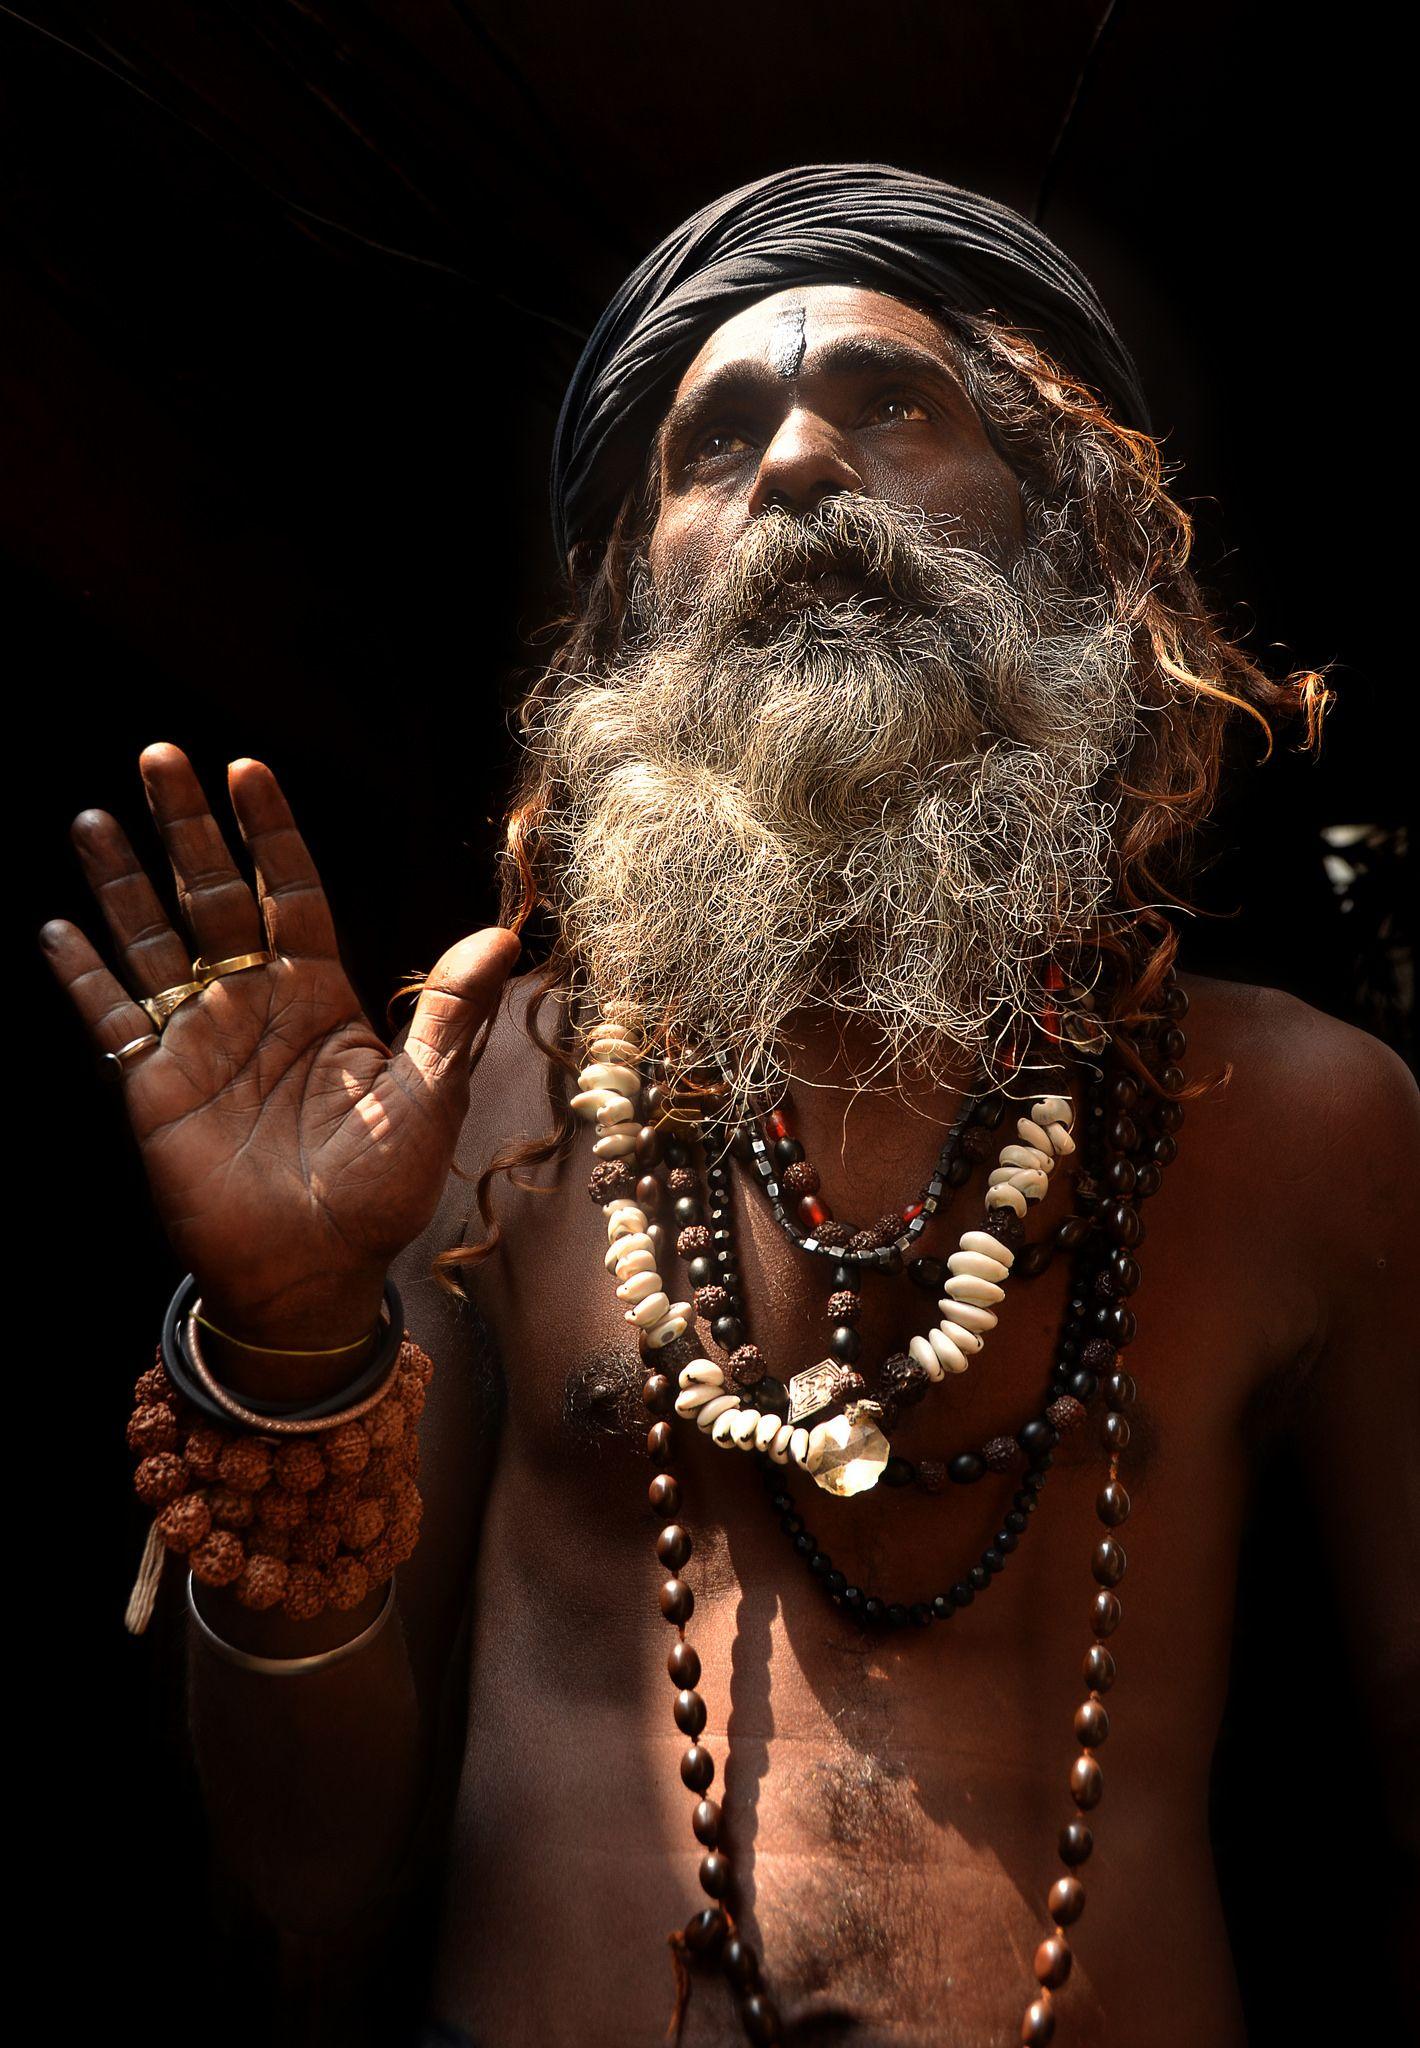 Aghori Sadhu powerful portrait, Varanasi, India | aghori